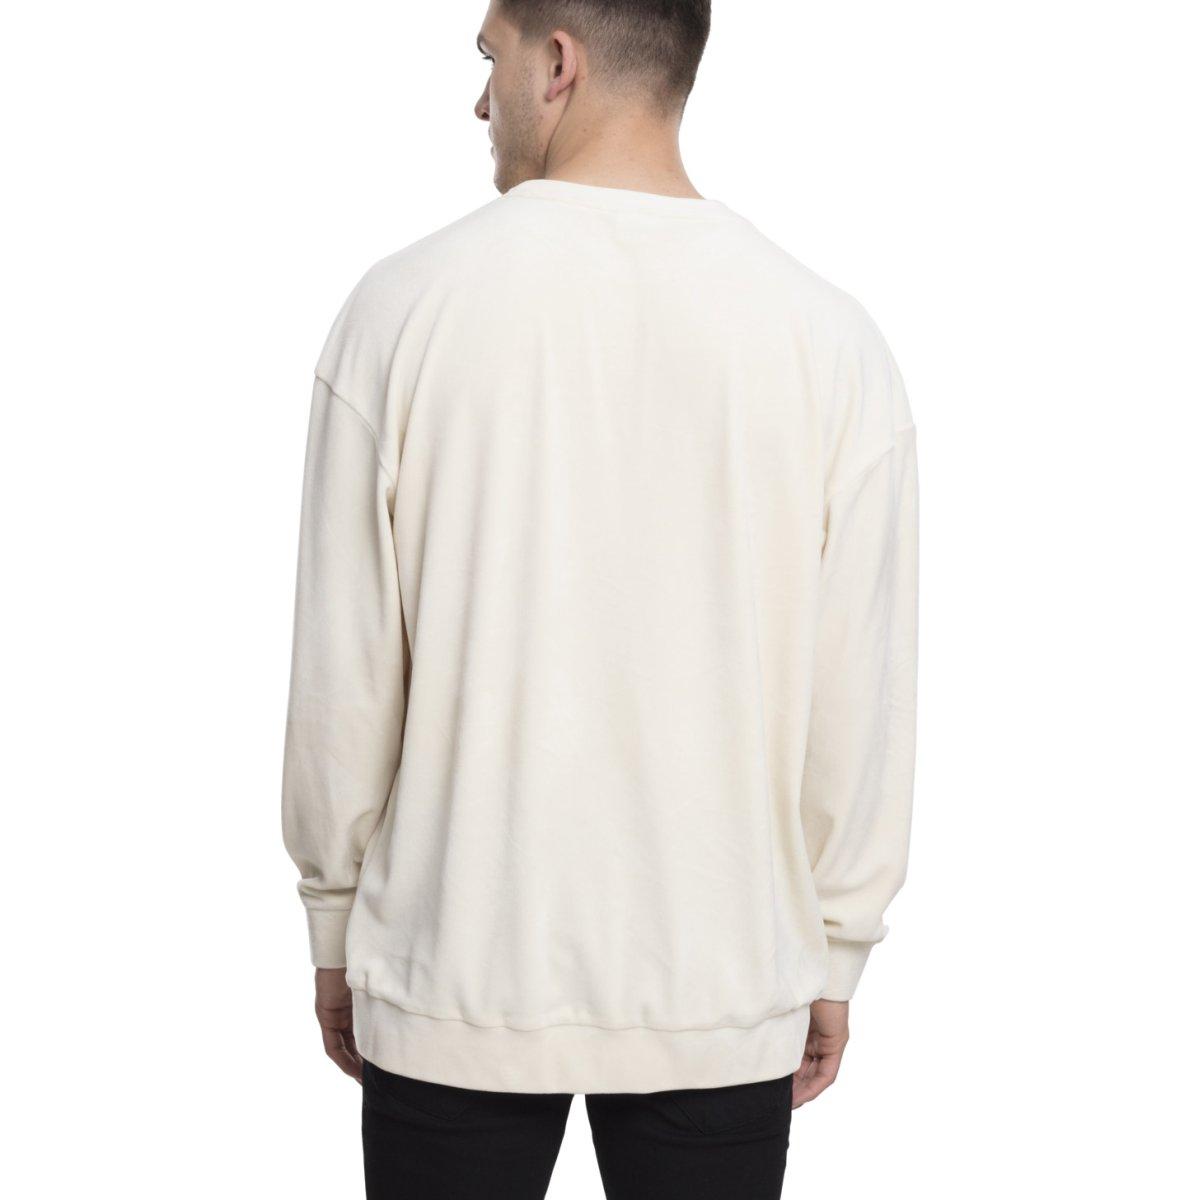 Urban-Classics-VELVET-Oversized-Crewneck-Pullover